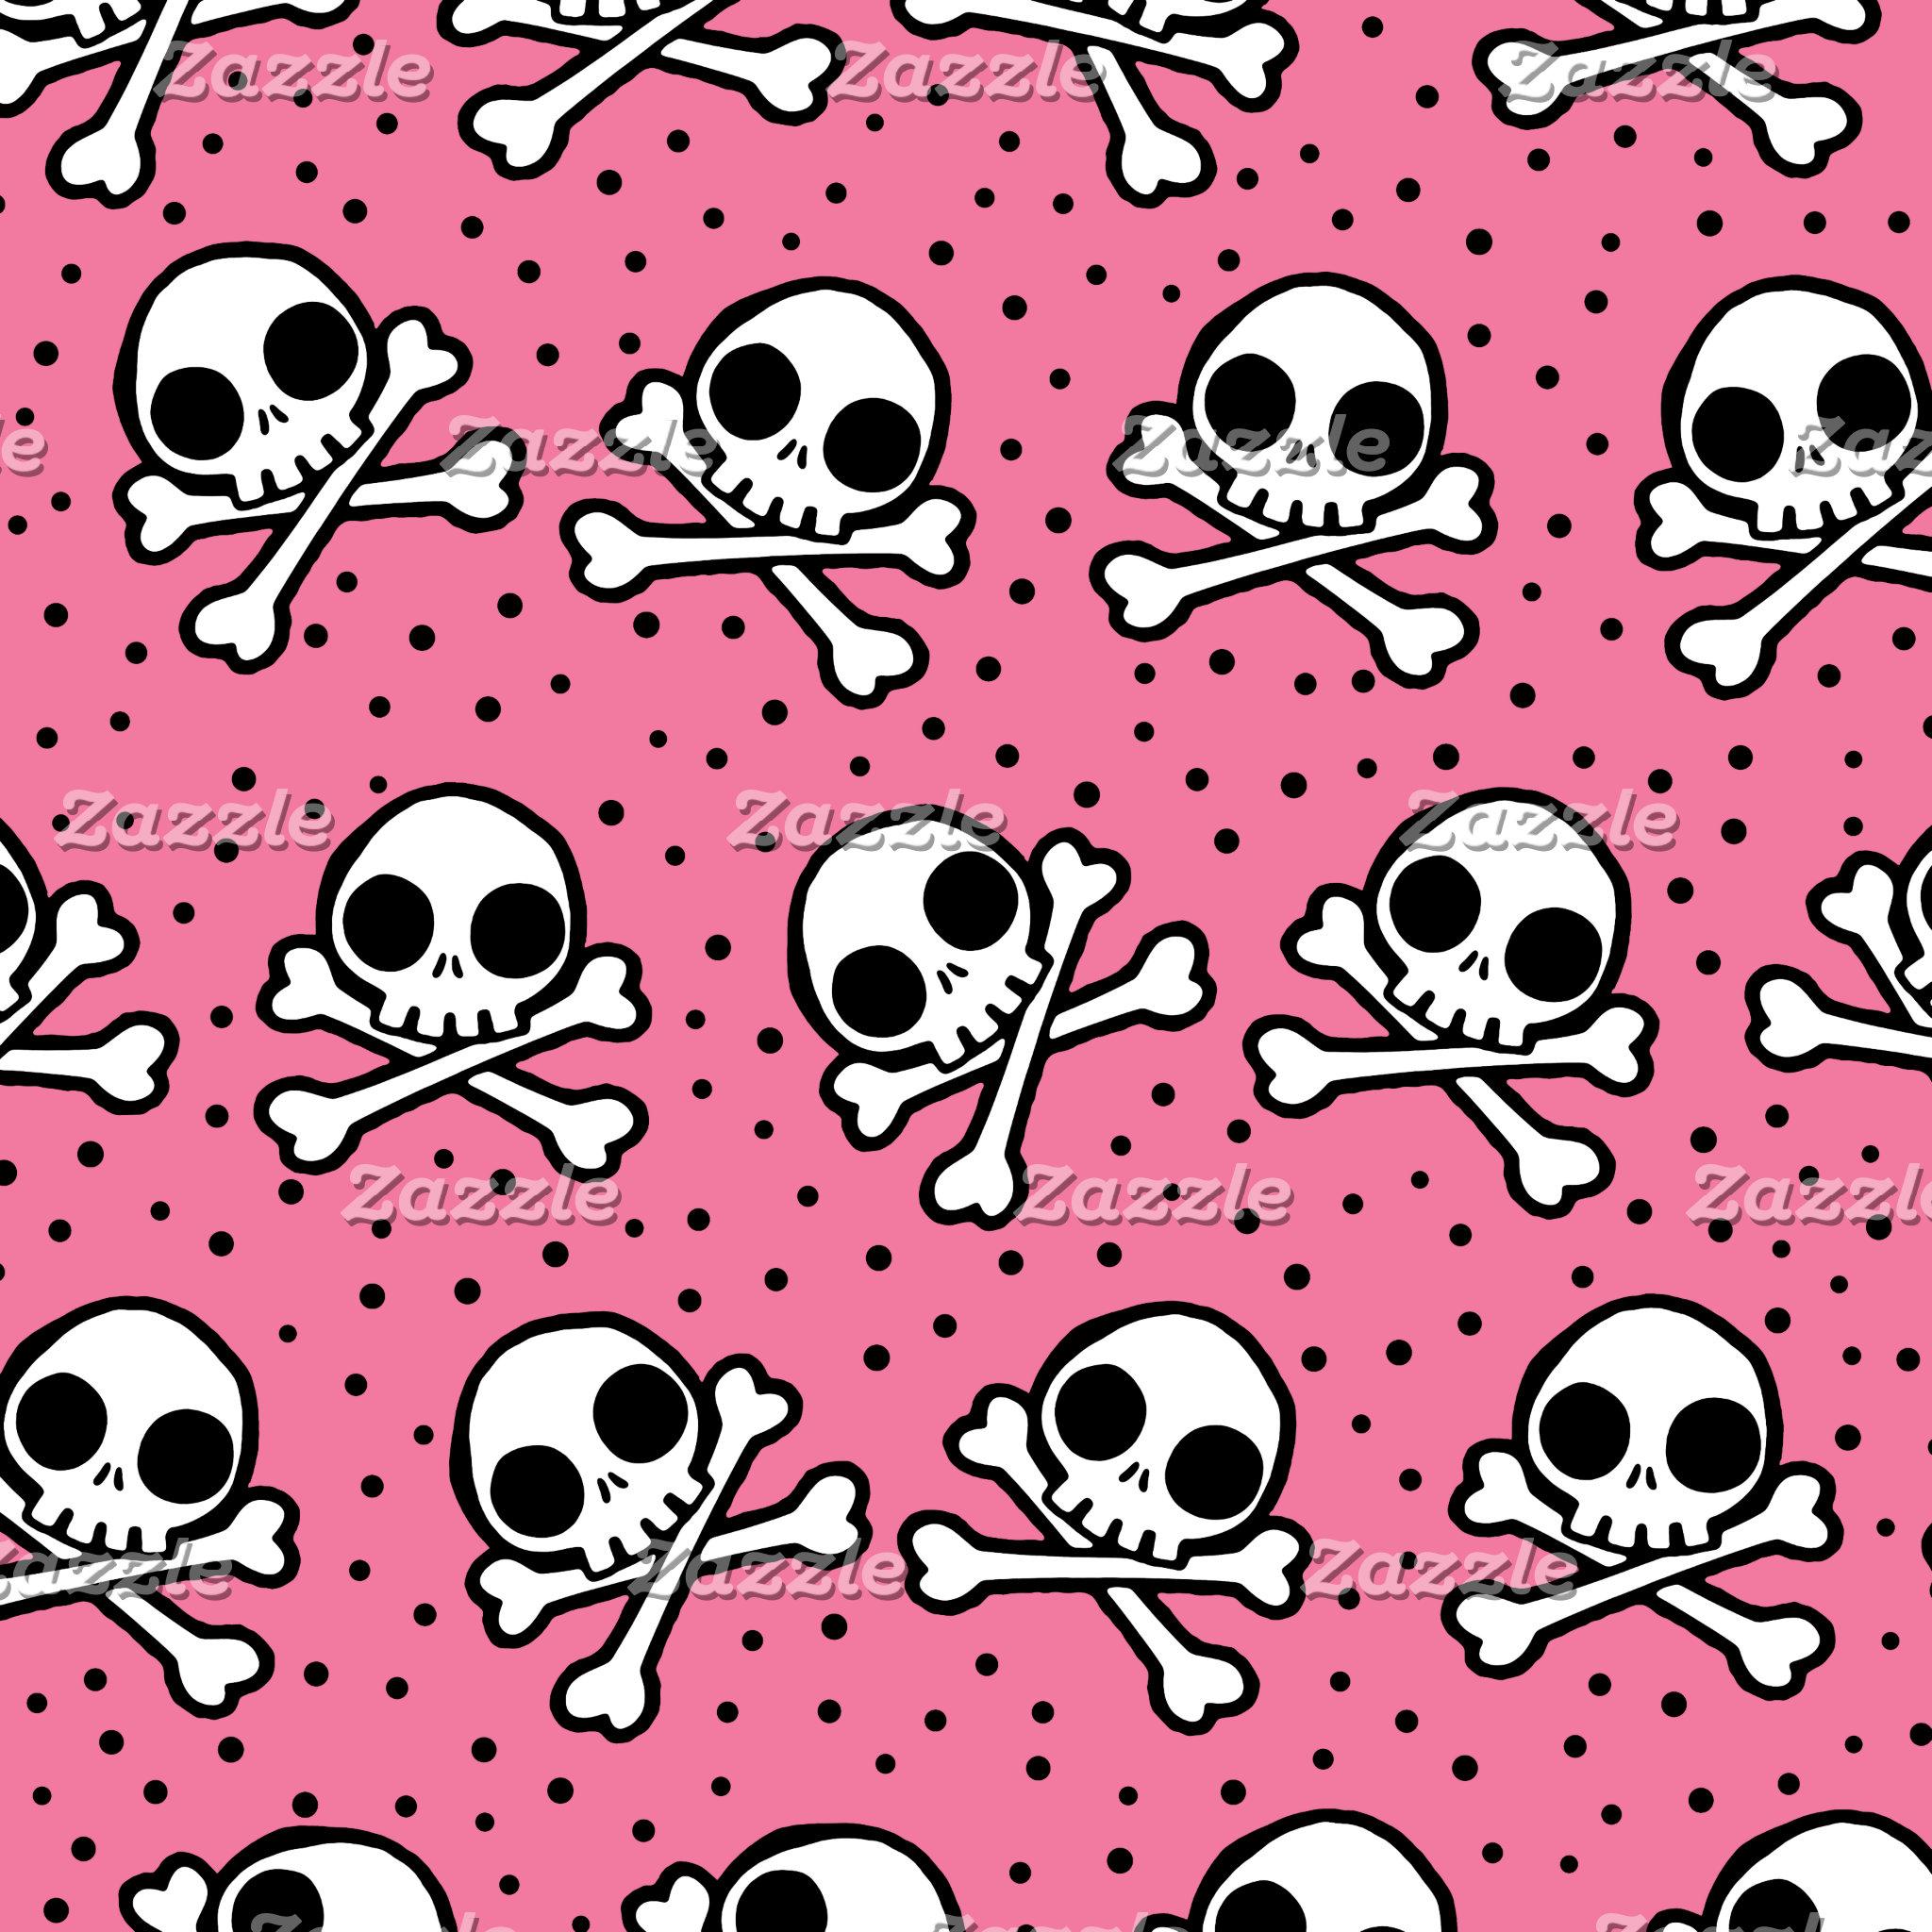 Cute Pink Skull And Crossbones Pattern